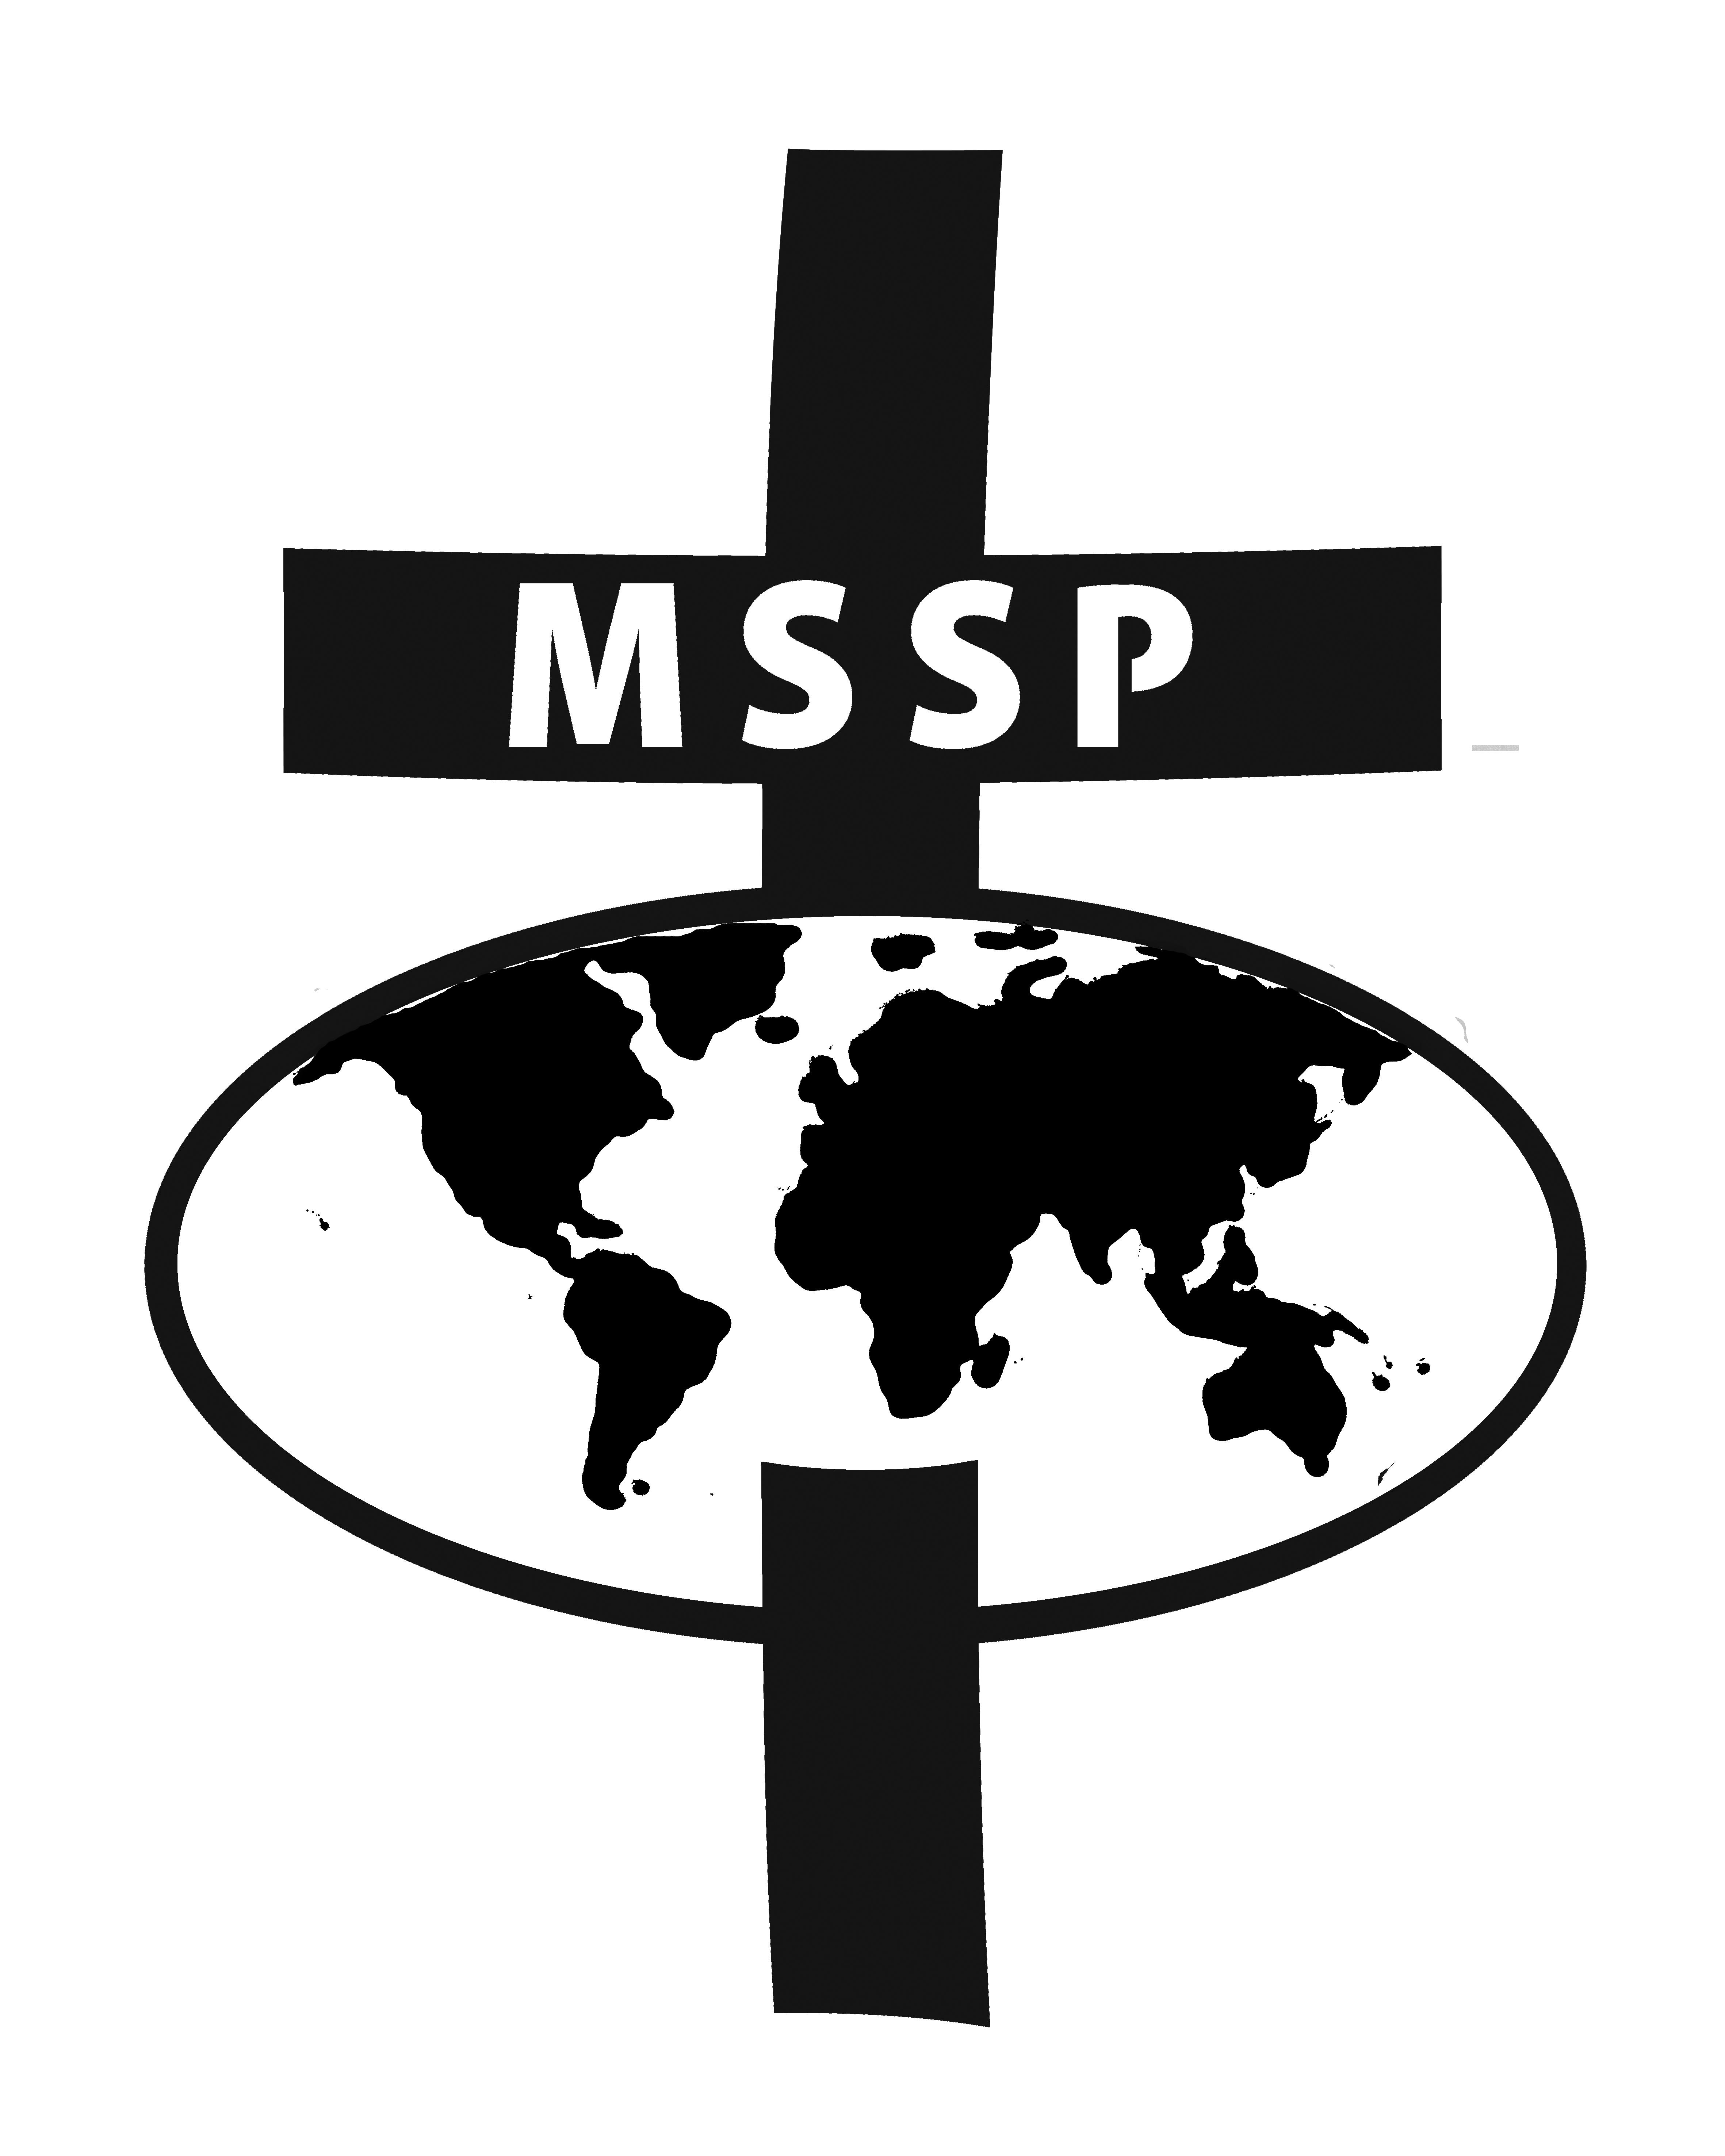 mssp-001